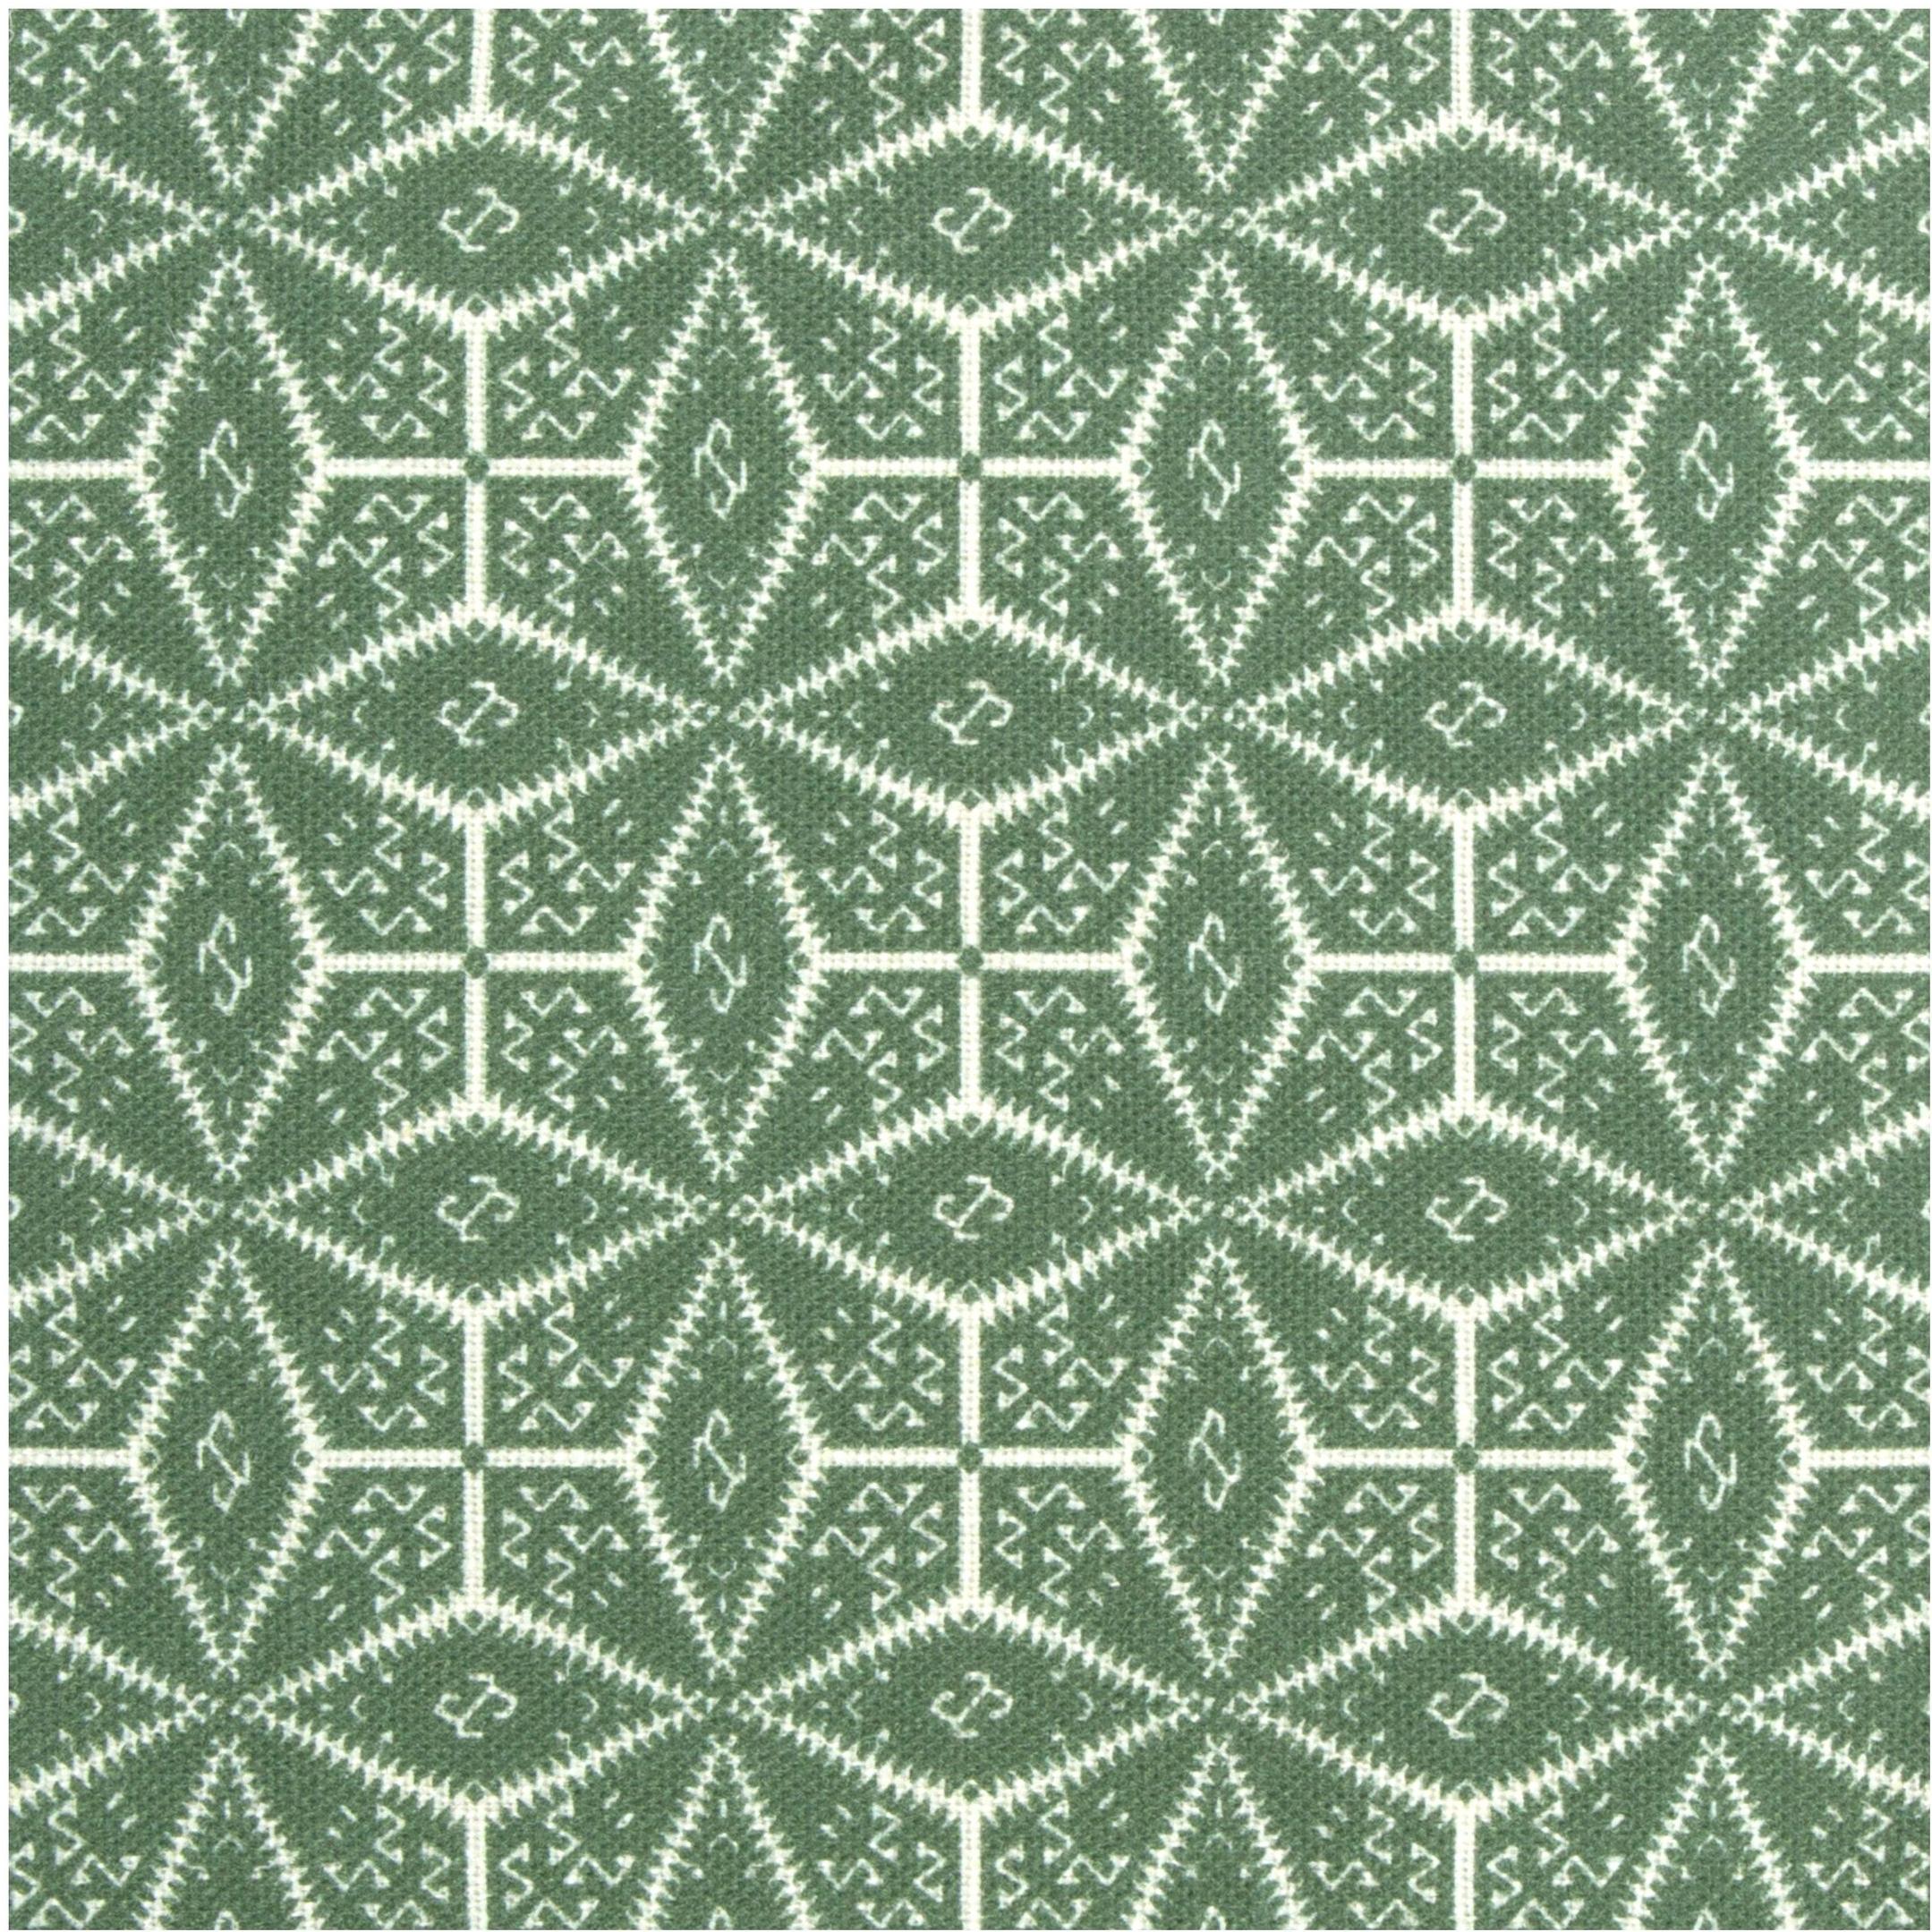 Textile_green.jpg